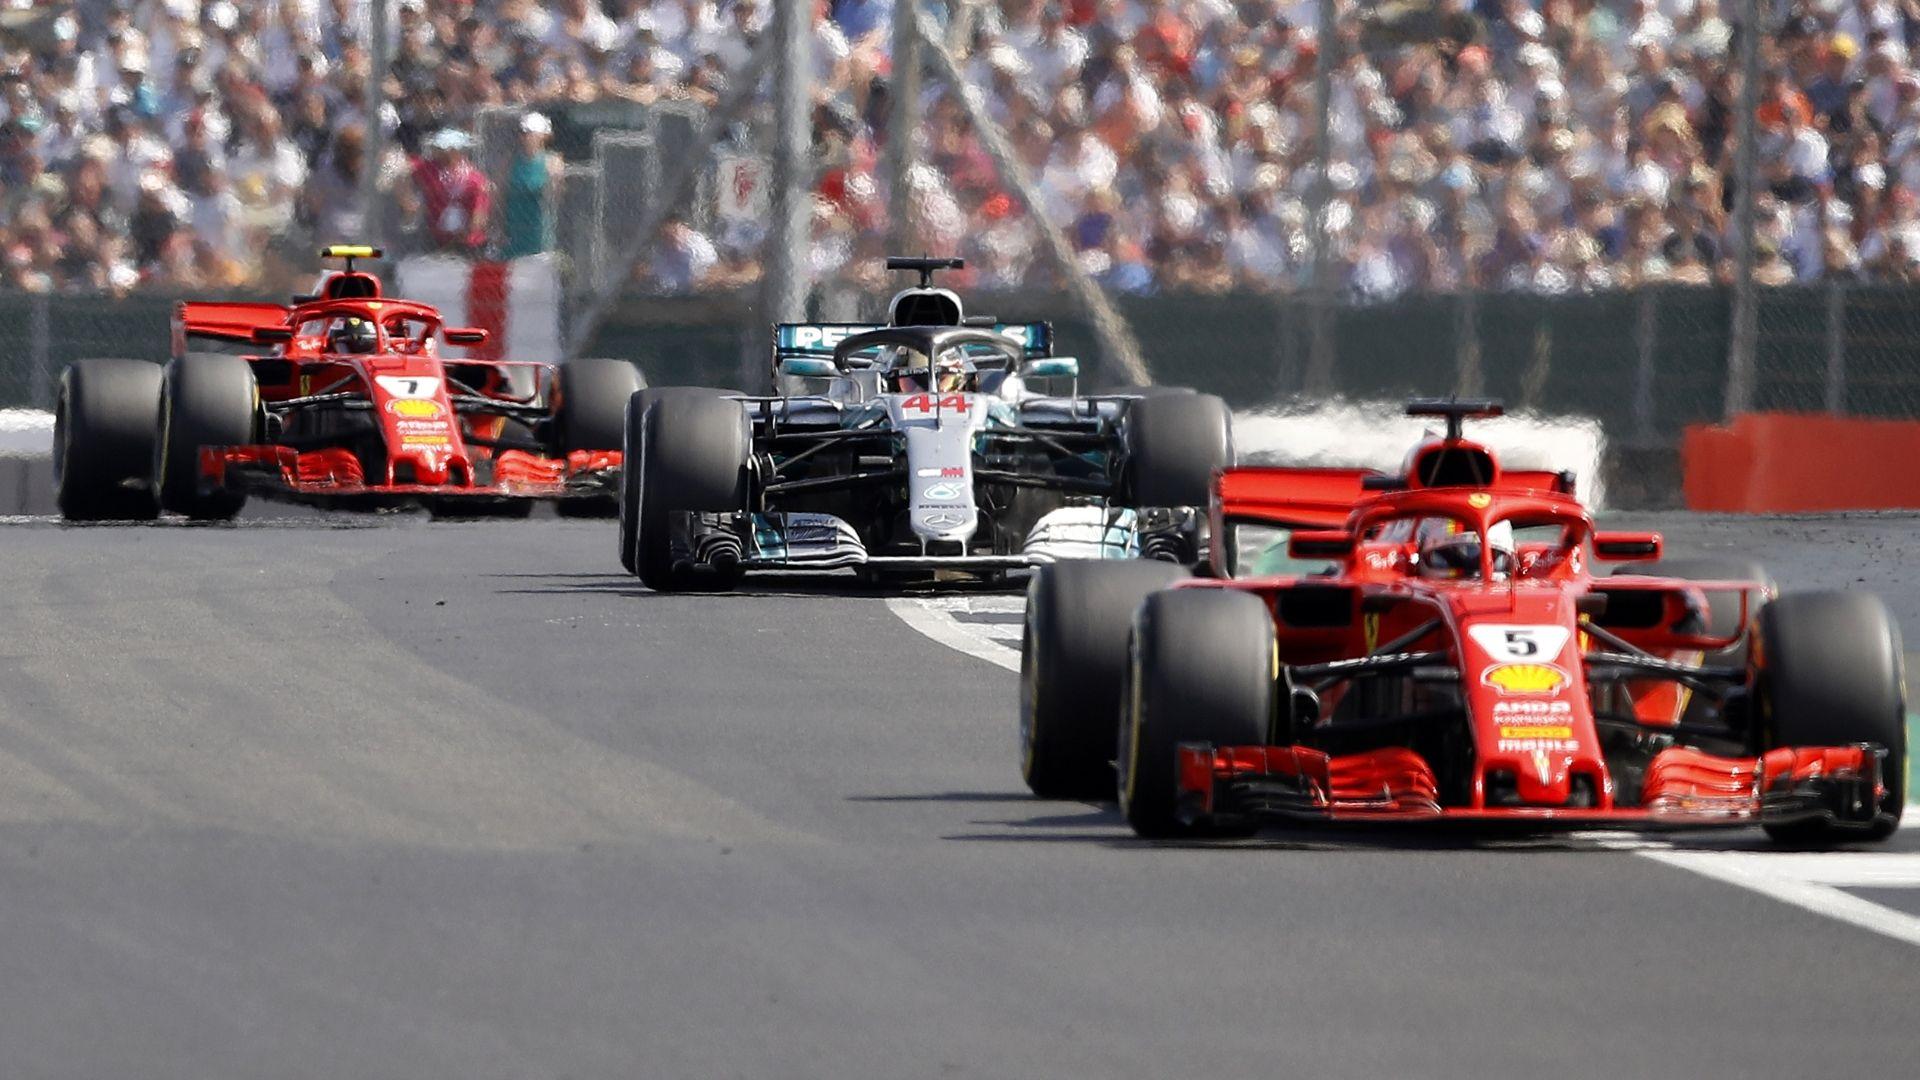 Has Ferrari found the winning formula?